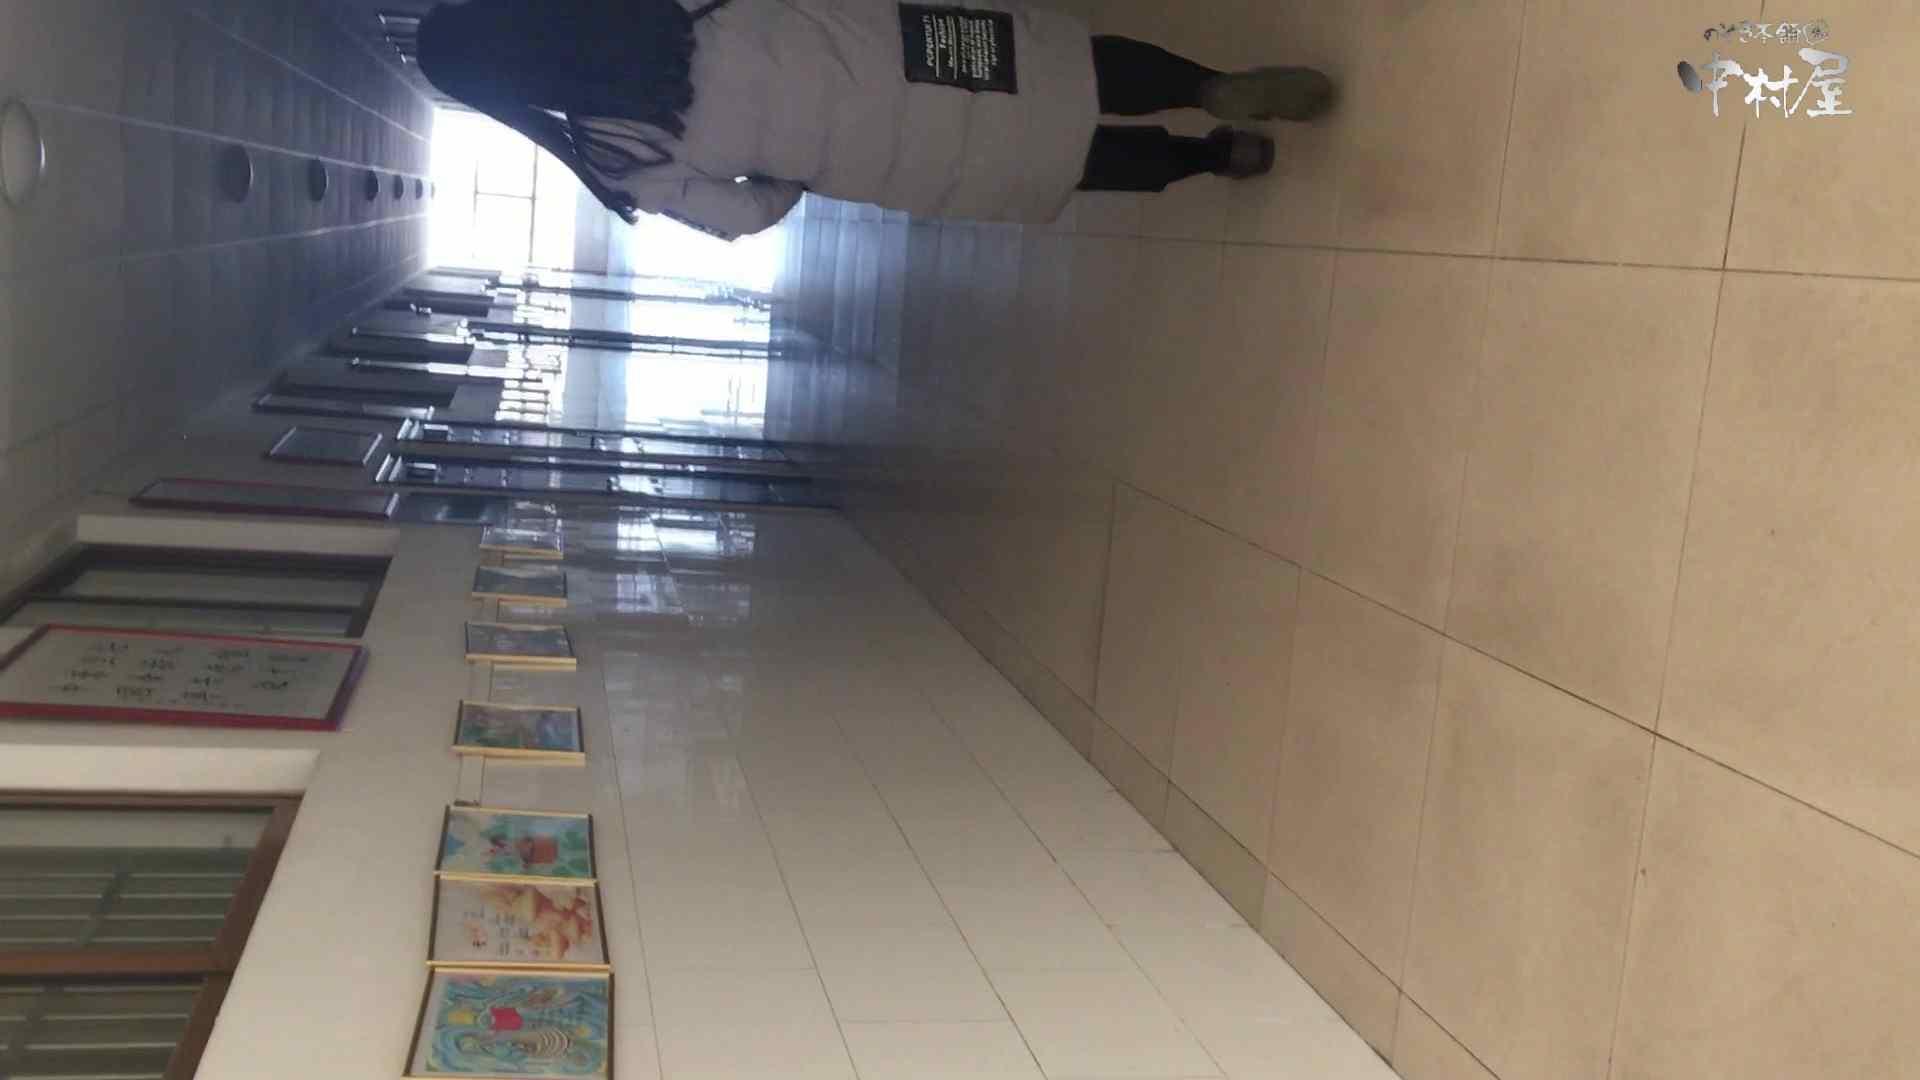 GOD HAND 芸術大学盗撮‼vol.88 洗面所突入 ぱこり動画紹介 99pic 86